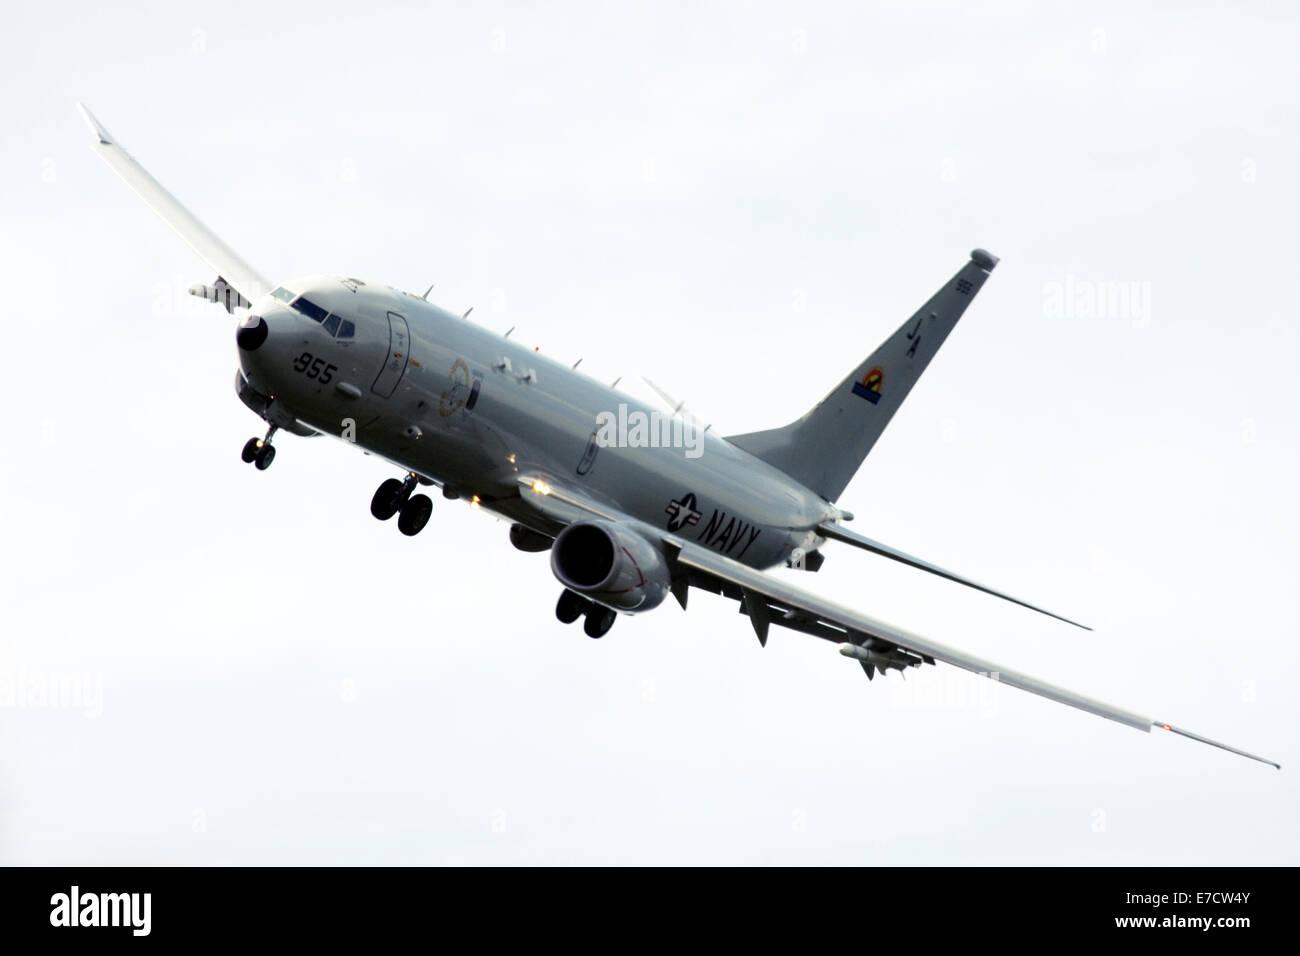 USA Navy Boeing P-8A Poseidon military aircraft at Farnborough International Airshow 2014 - Stock Image